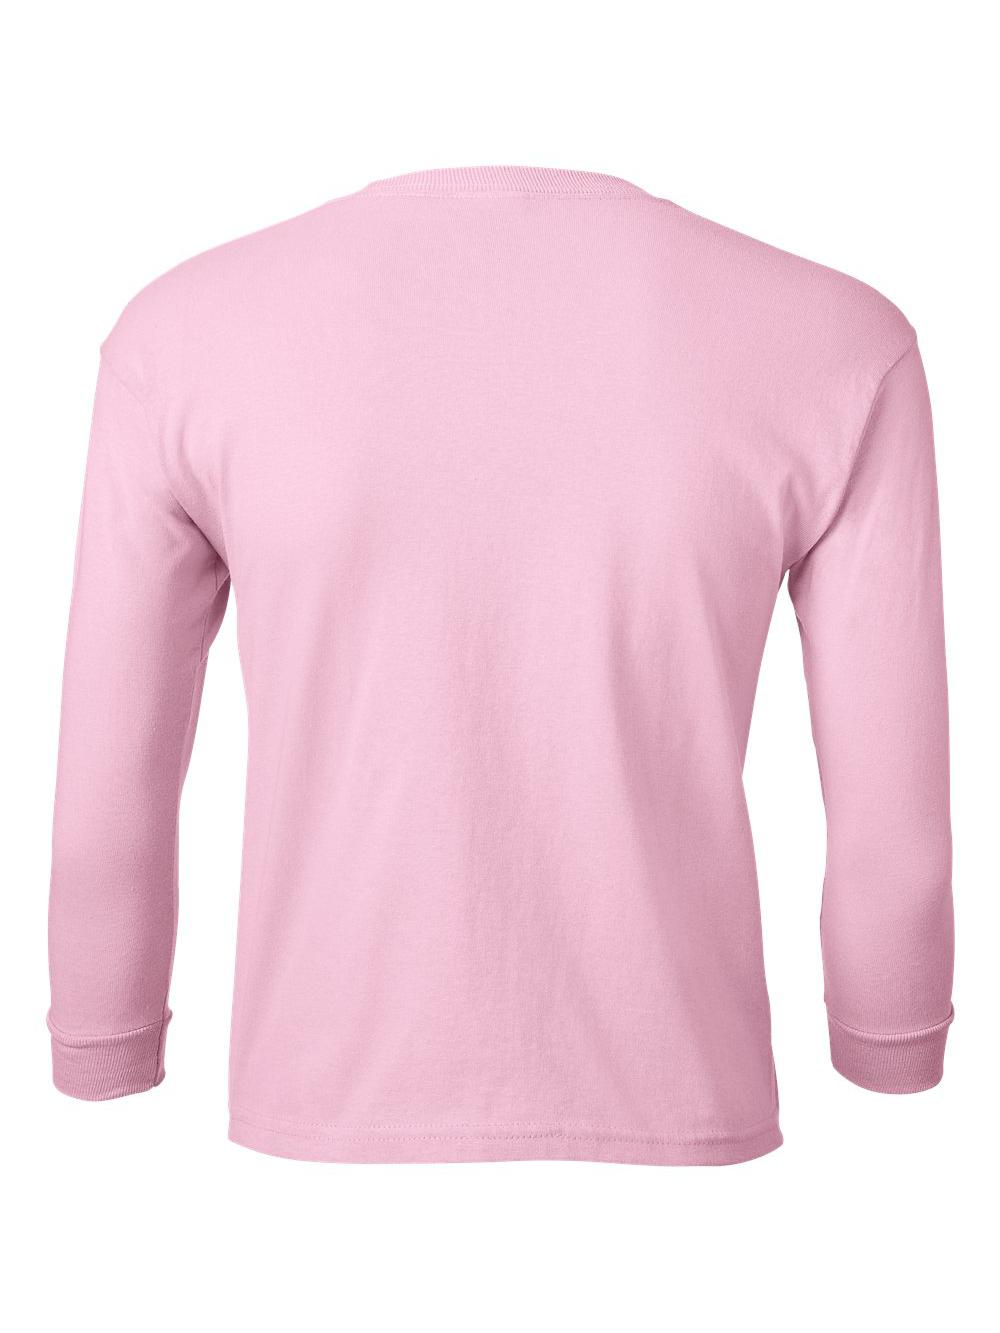 Gildan-Ultra-Cotton-Youth-Long-Sleeve-T-Shirt-2400B thumbnail 19